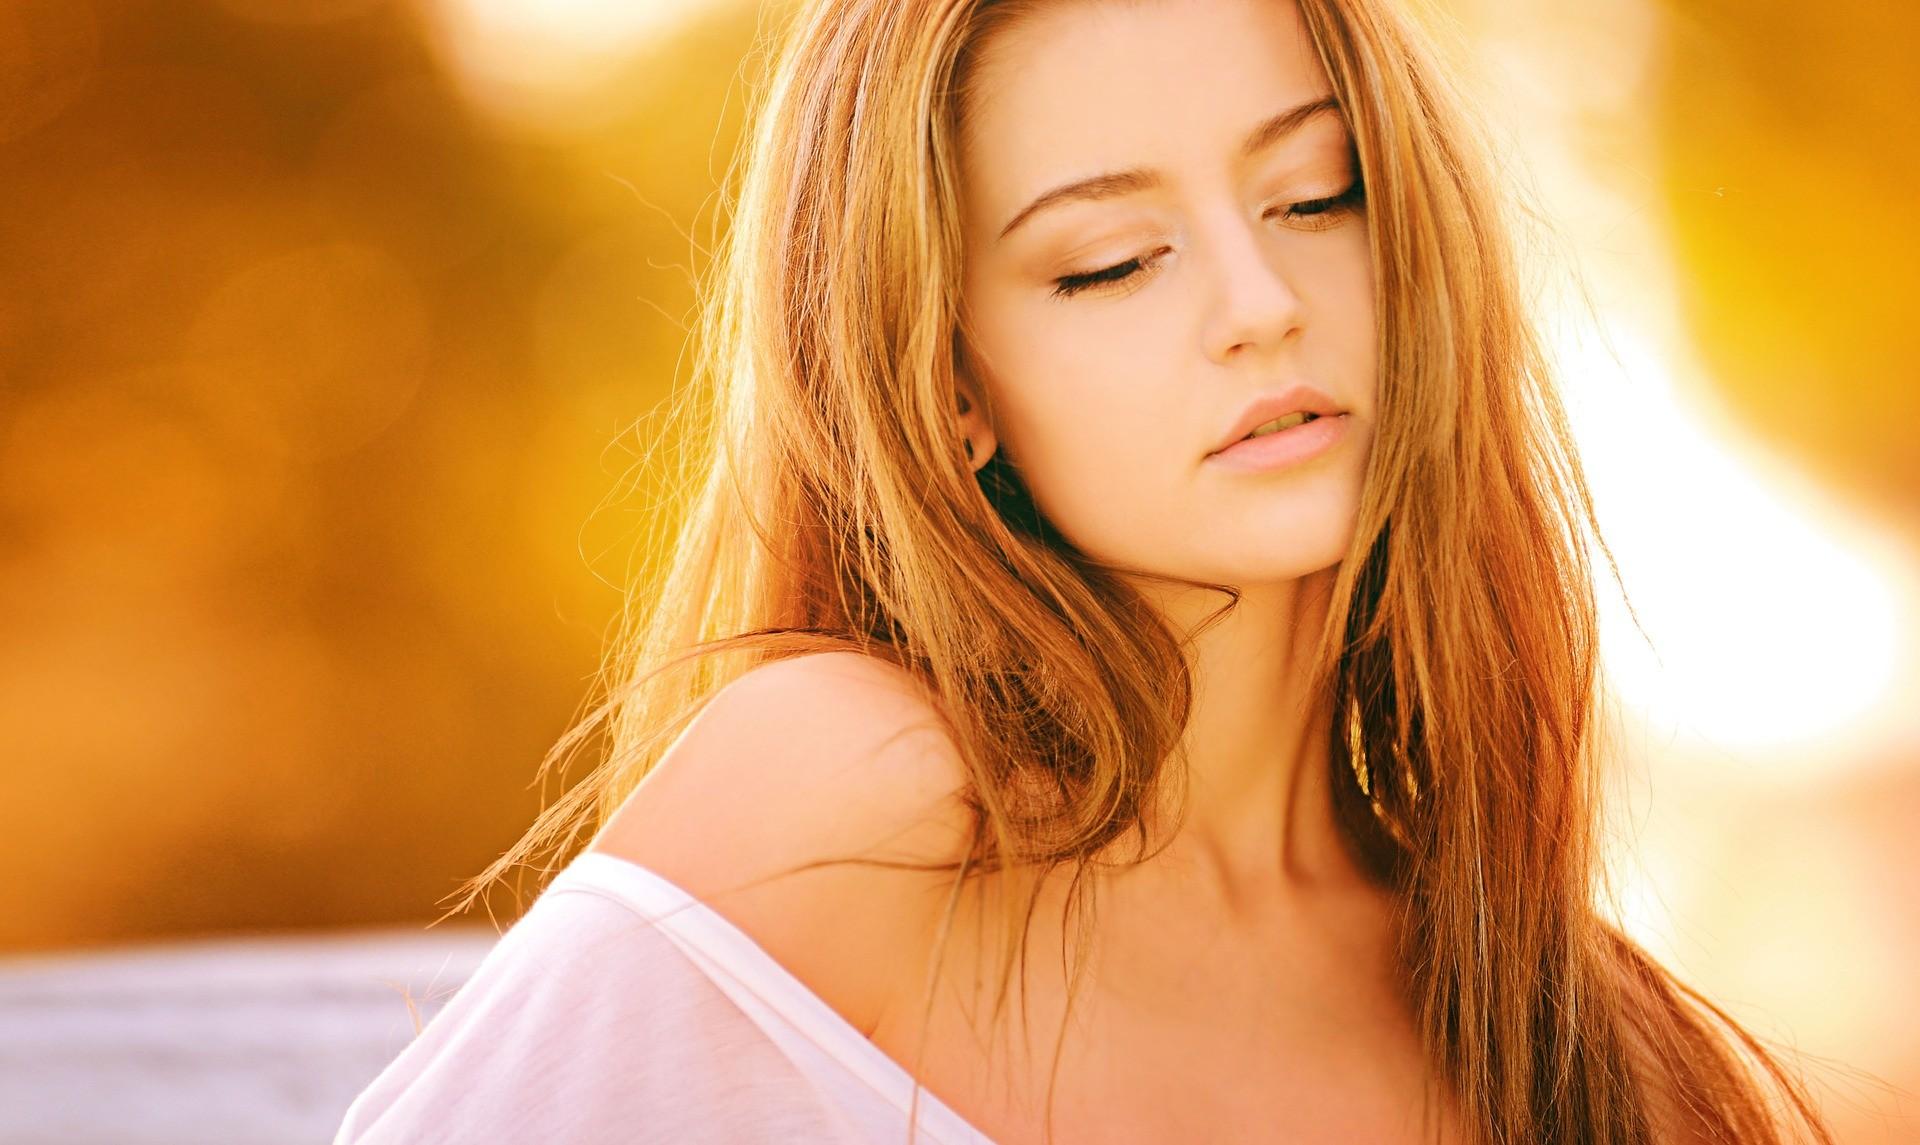 Vypadavaji Vam Vlasy A Trapi Vas Lamavost Nehtu Vyzkousejte Tohle Prirodni Reseni Www Vitalitis Cz